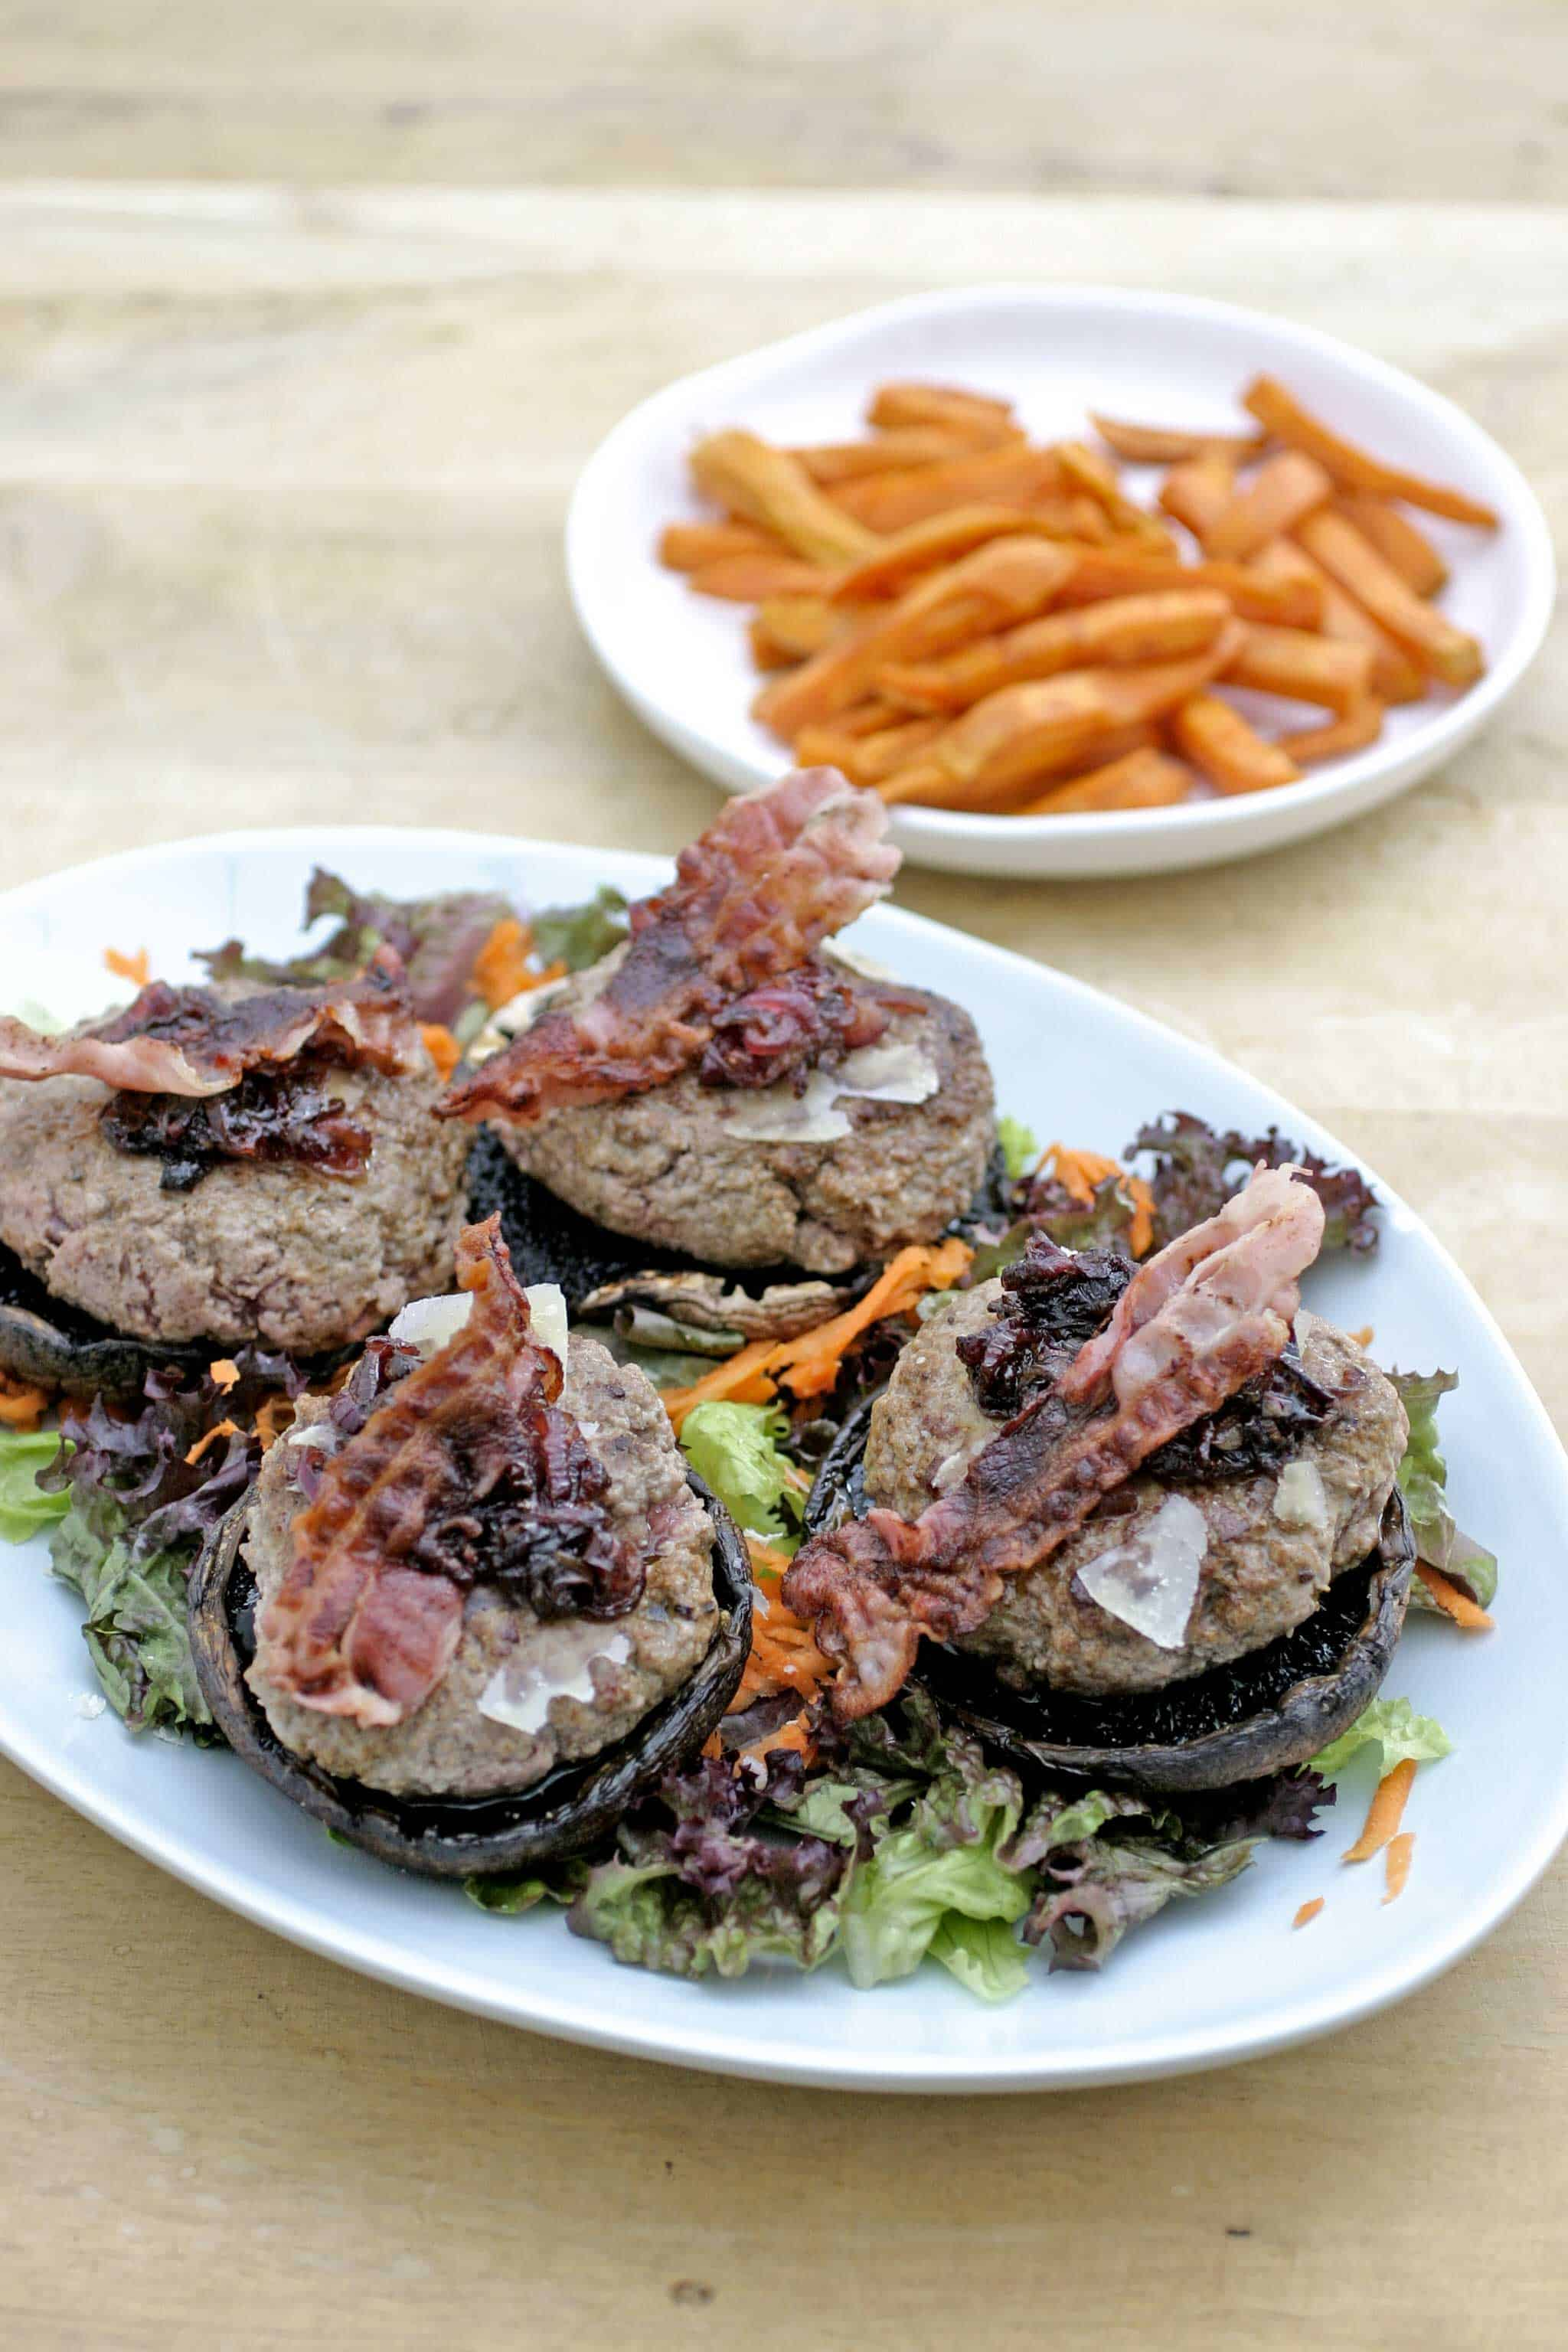 BLT burgers met portobello | Keukenrevolutie. Foodblog